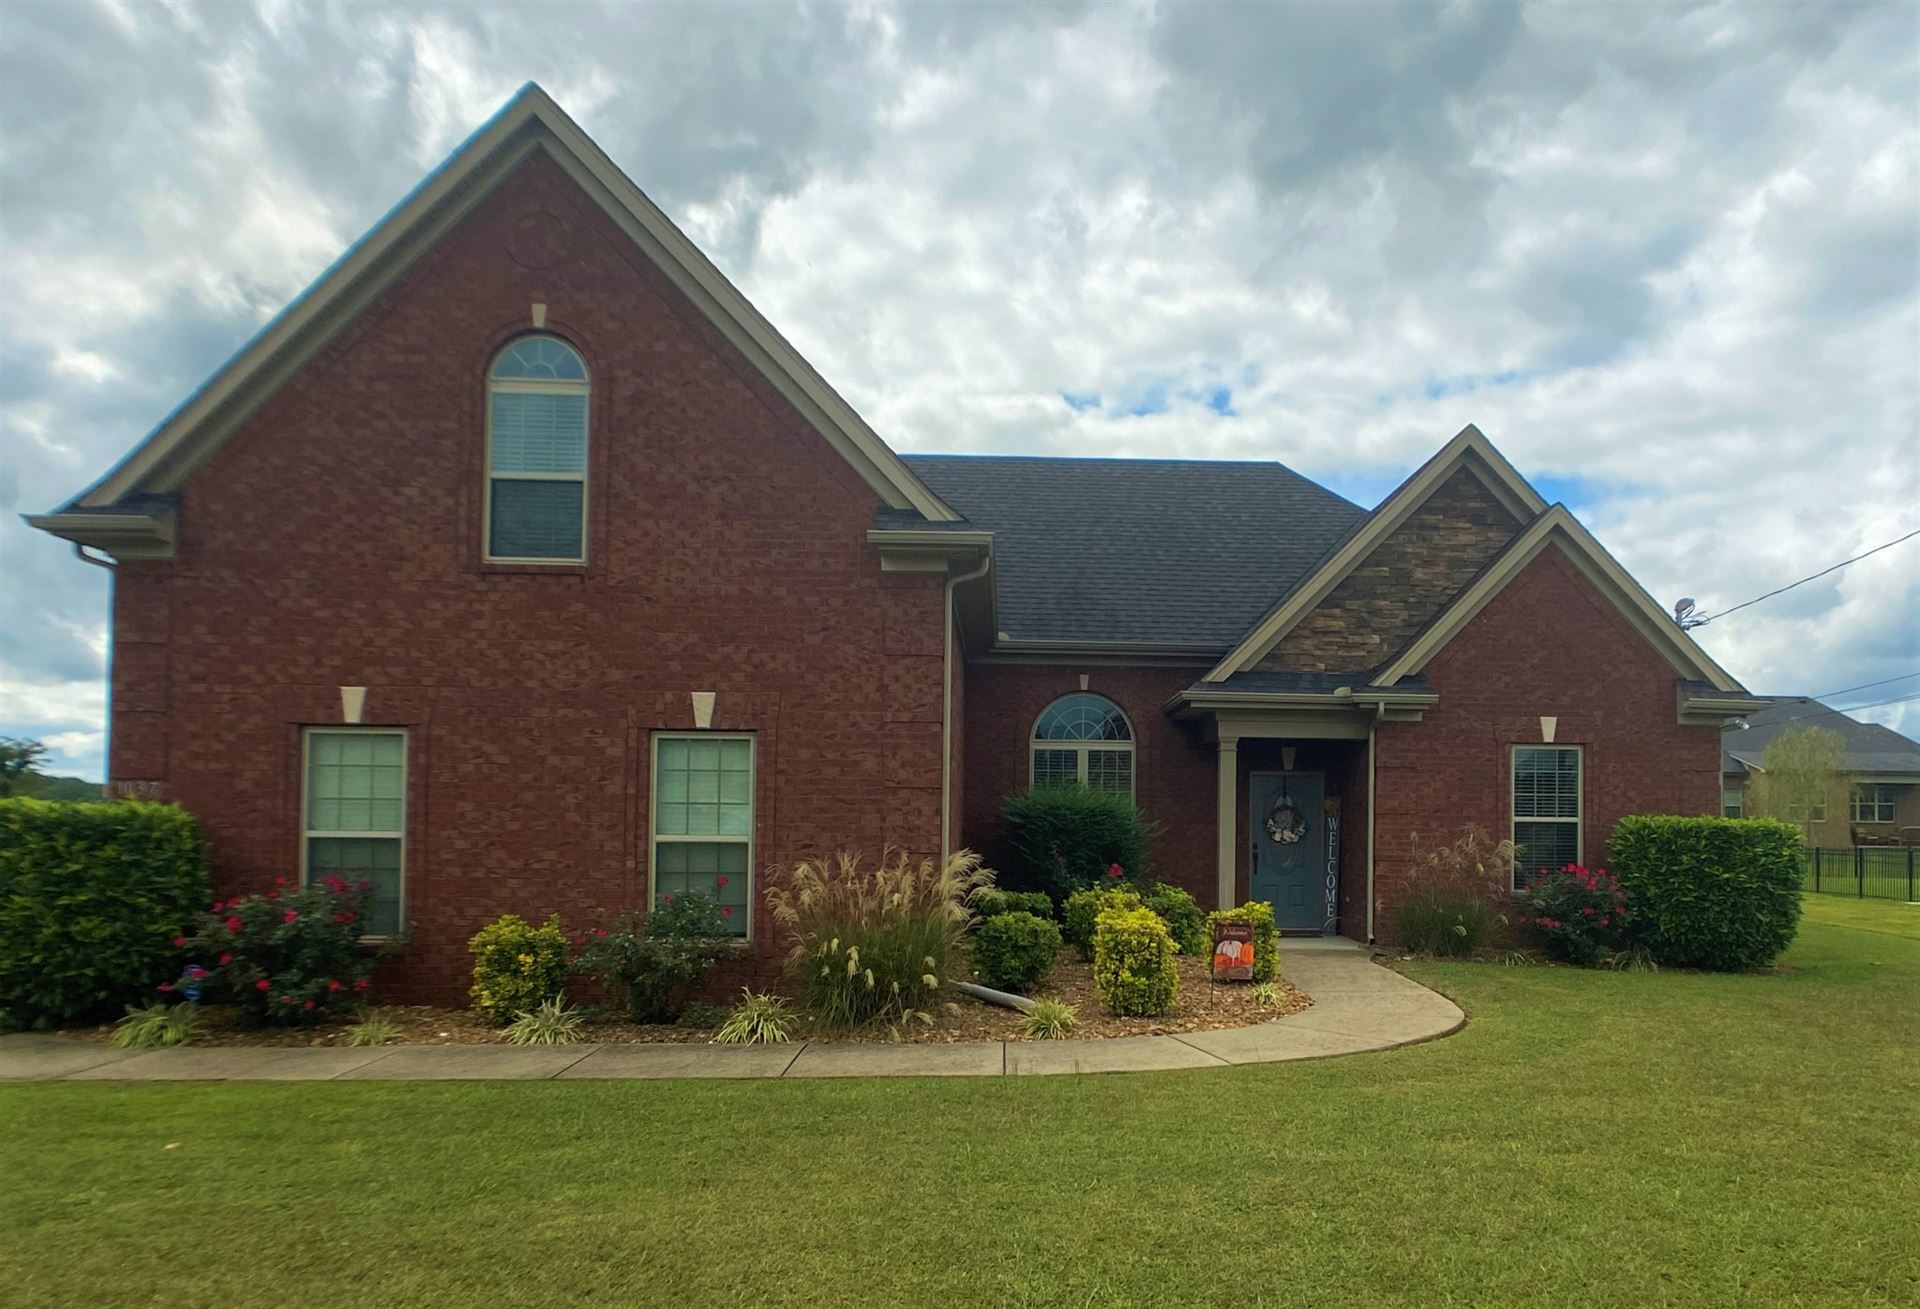 1037 Spring Creek Dr, Murfreesboro, TN 37129 - MLS#: 2193128